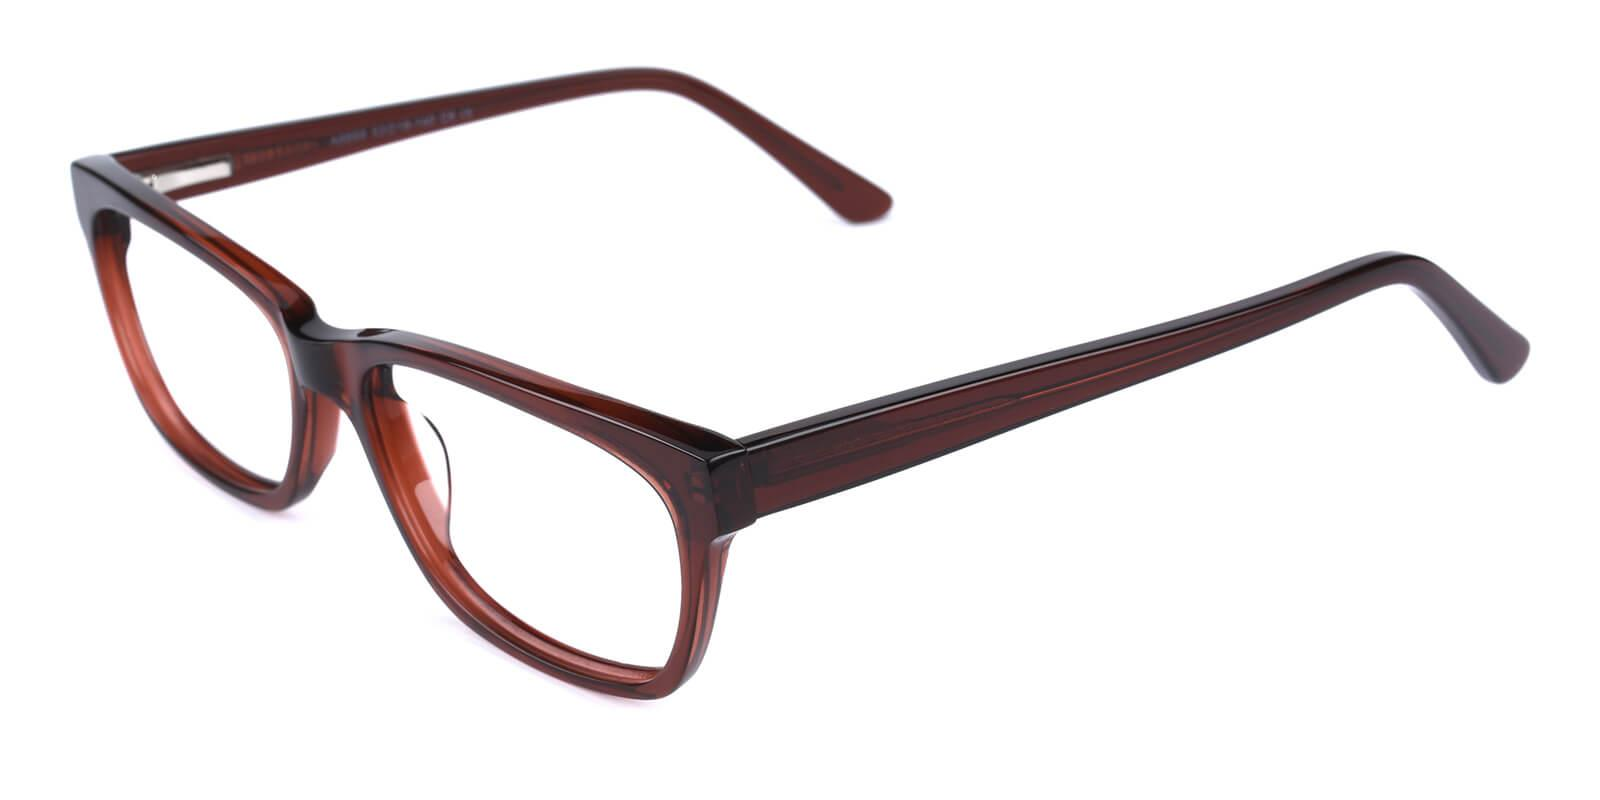 Mizura-Brown-Cat-Acetate-Eyeglasses-additional1